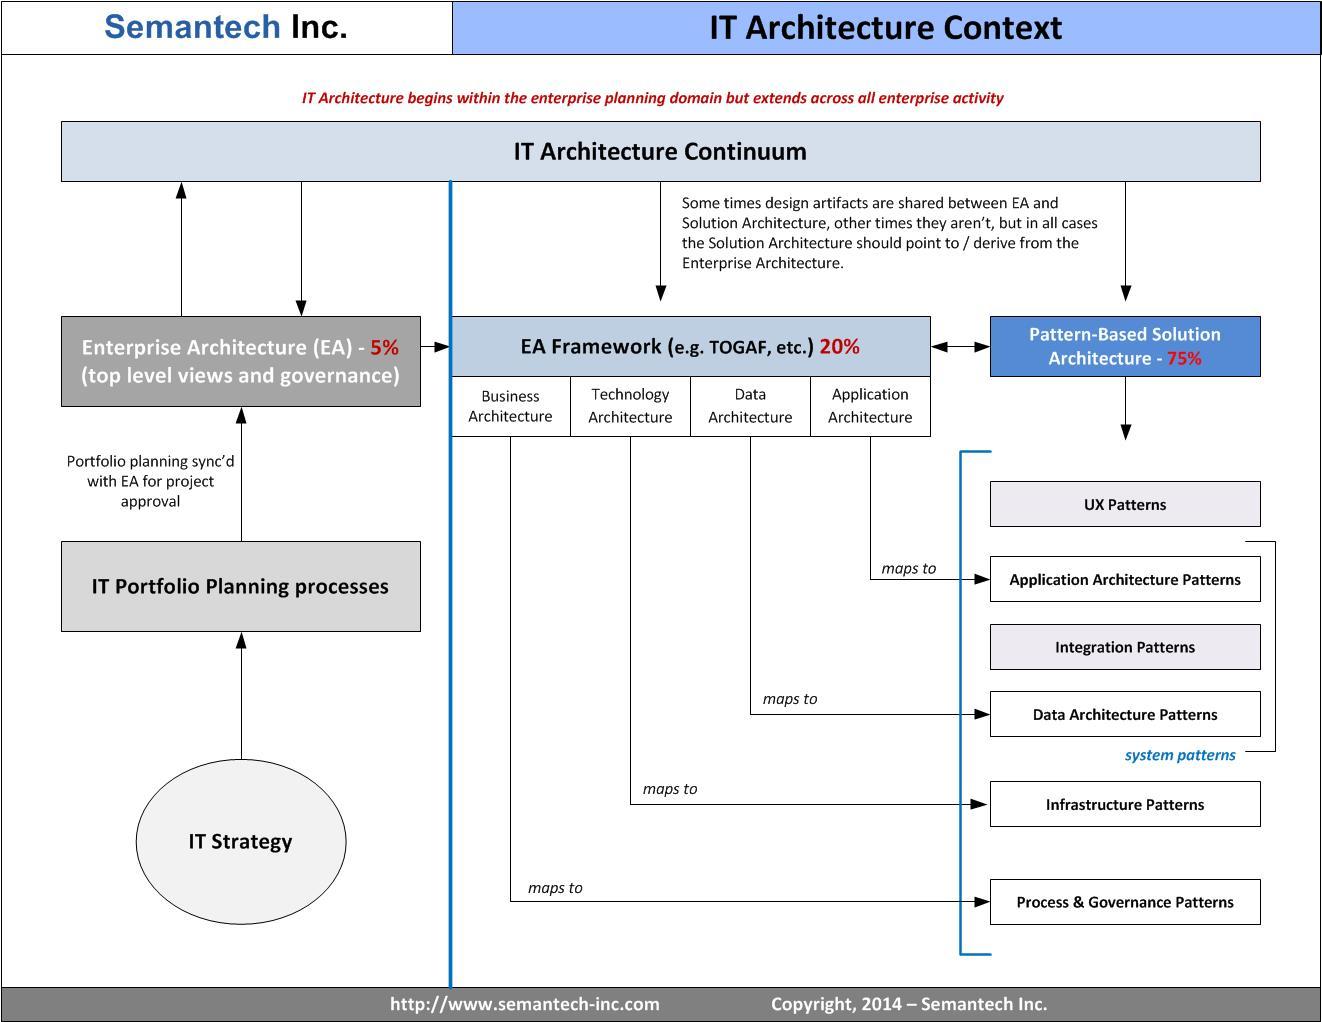 Semantech_ITArchitecture